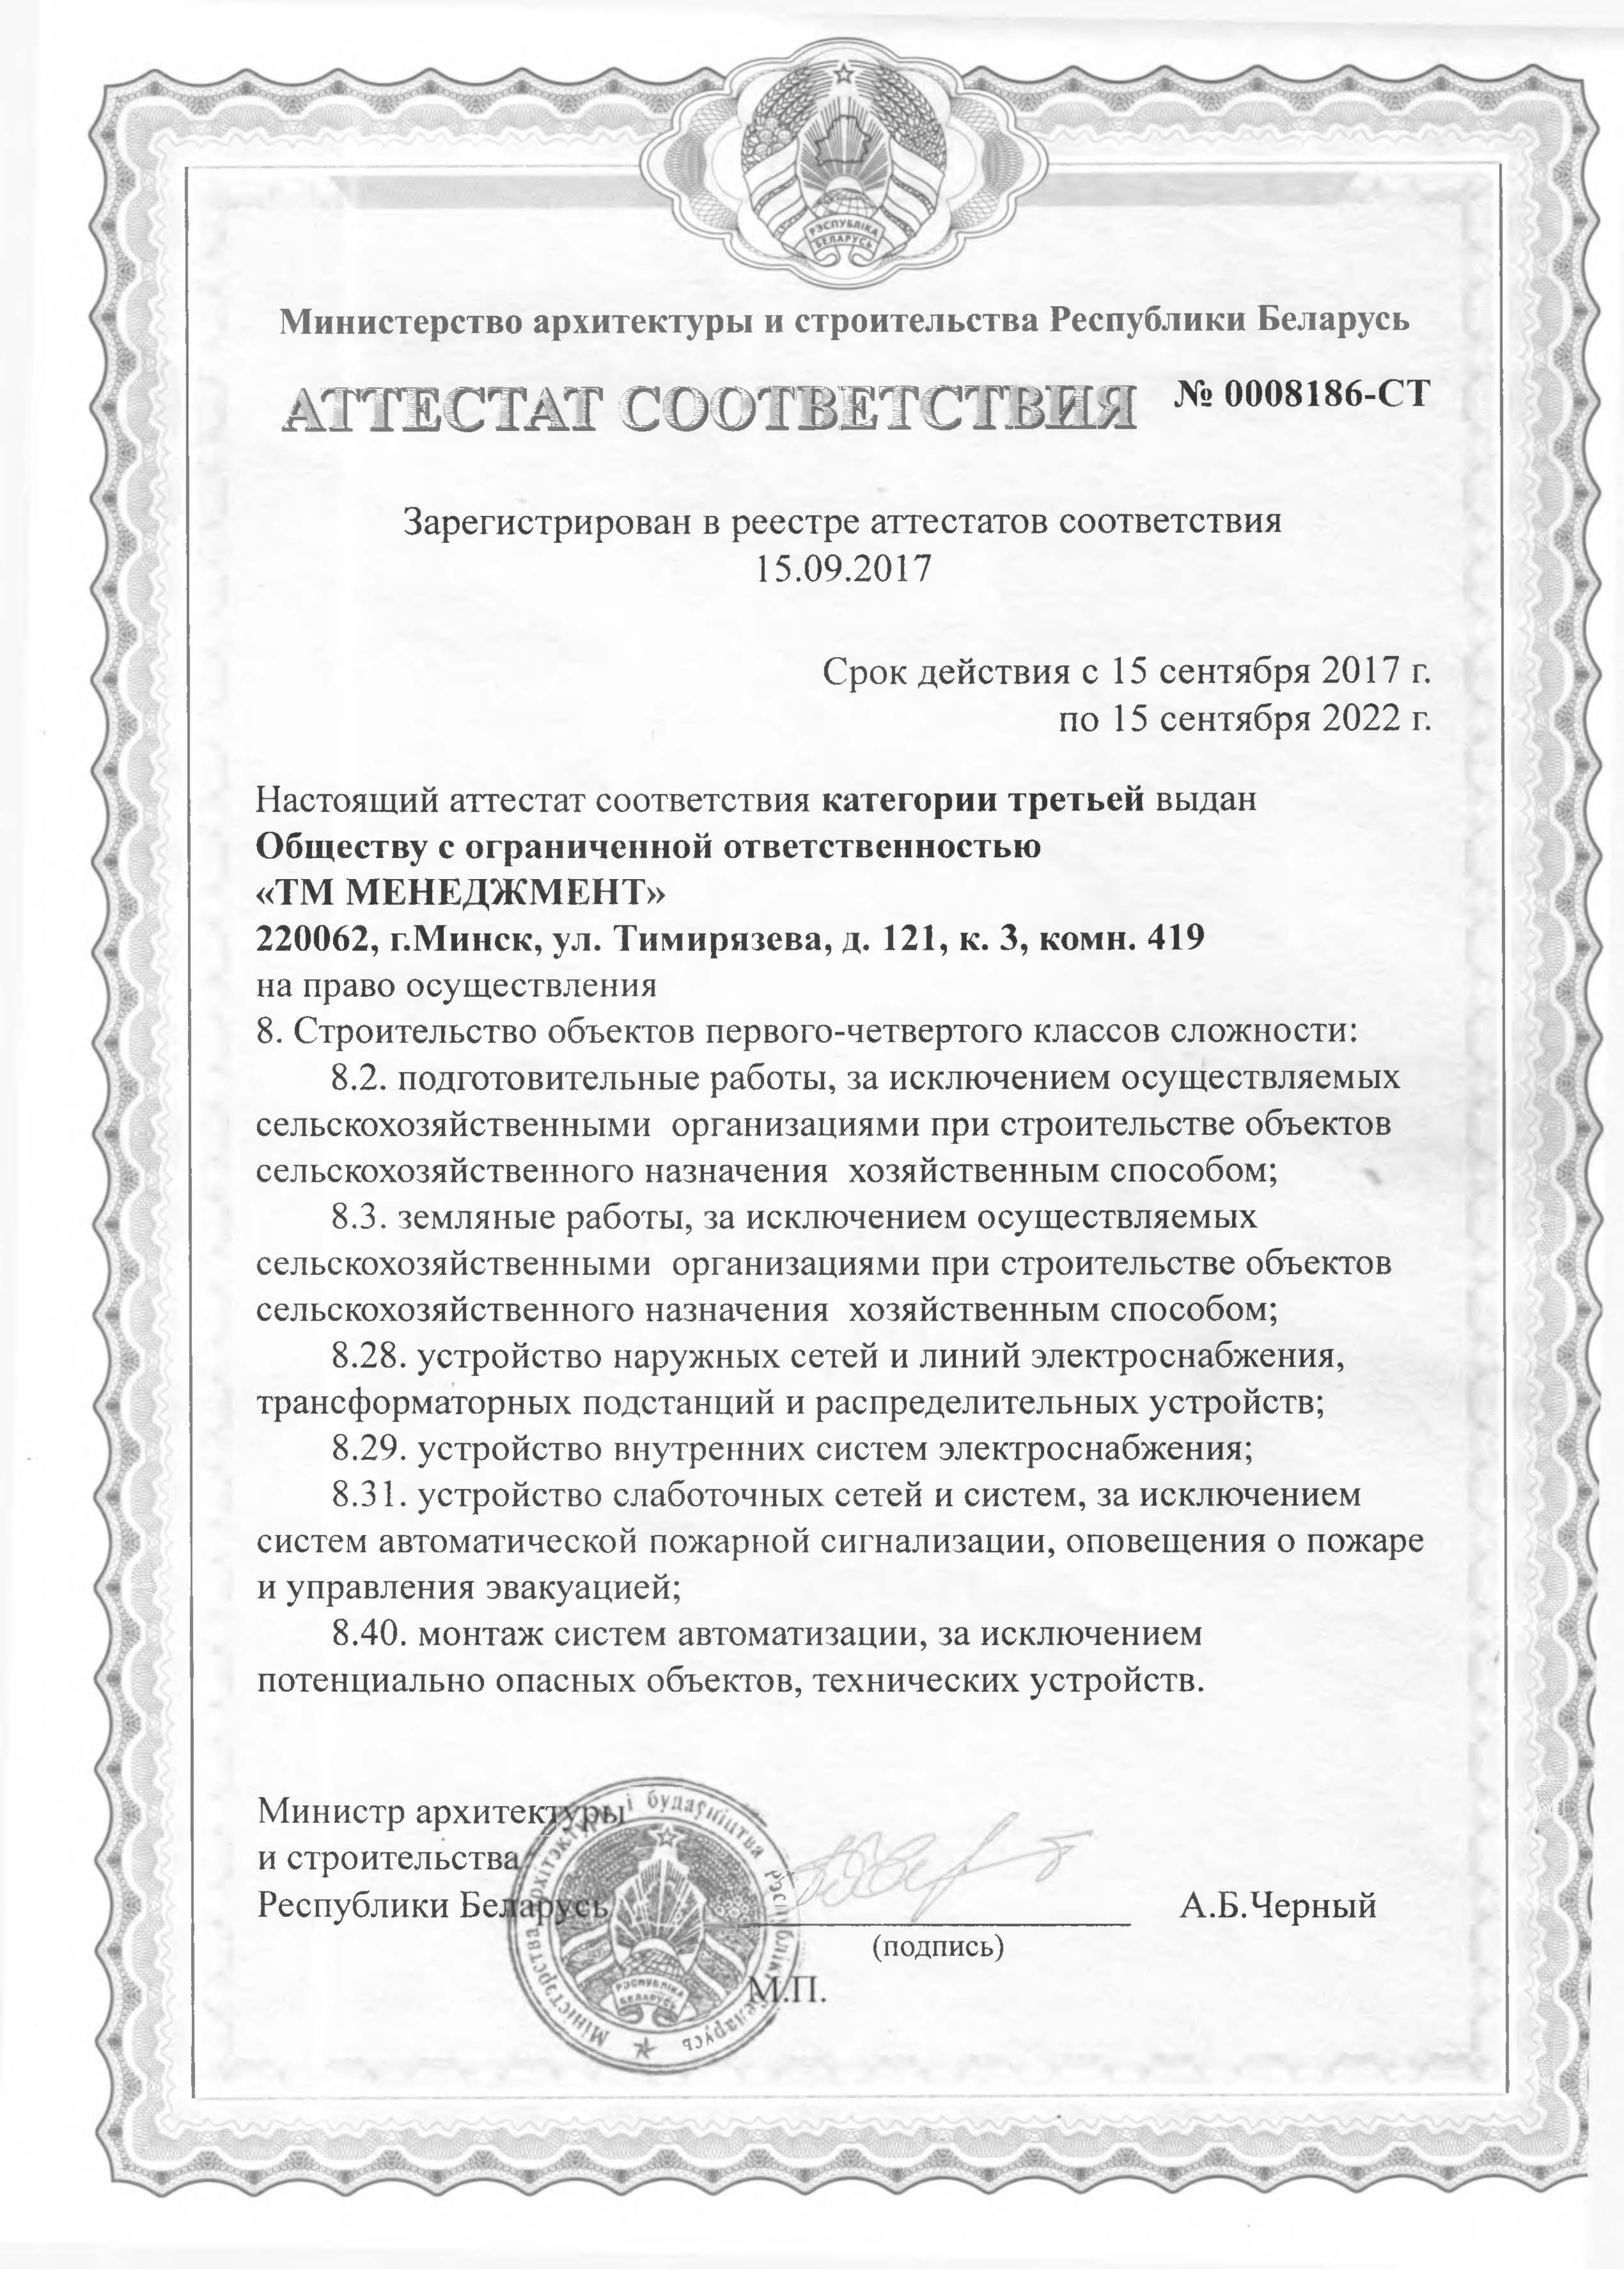 Аттестат соответствия ТМ МЕНЕДЖМЕНТ